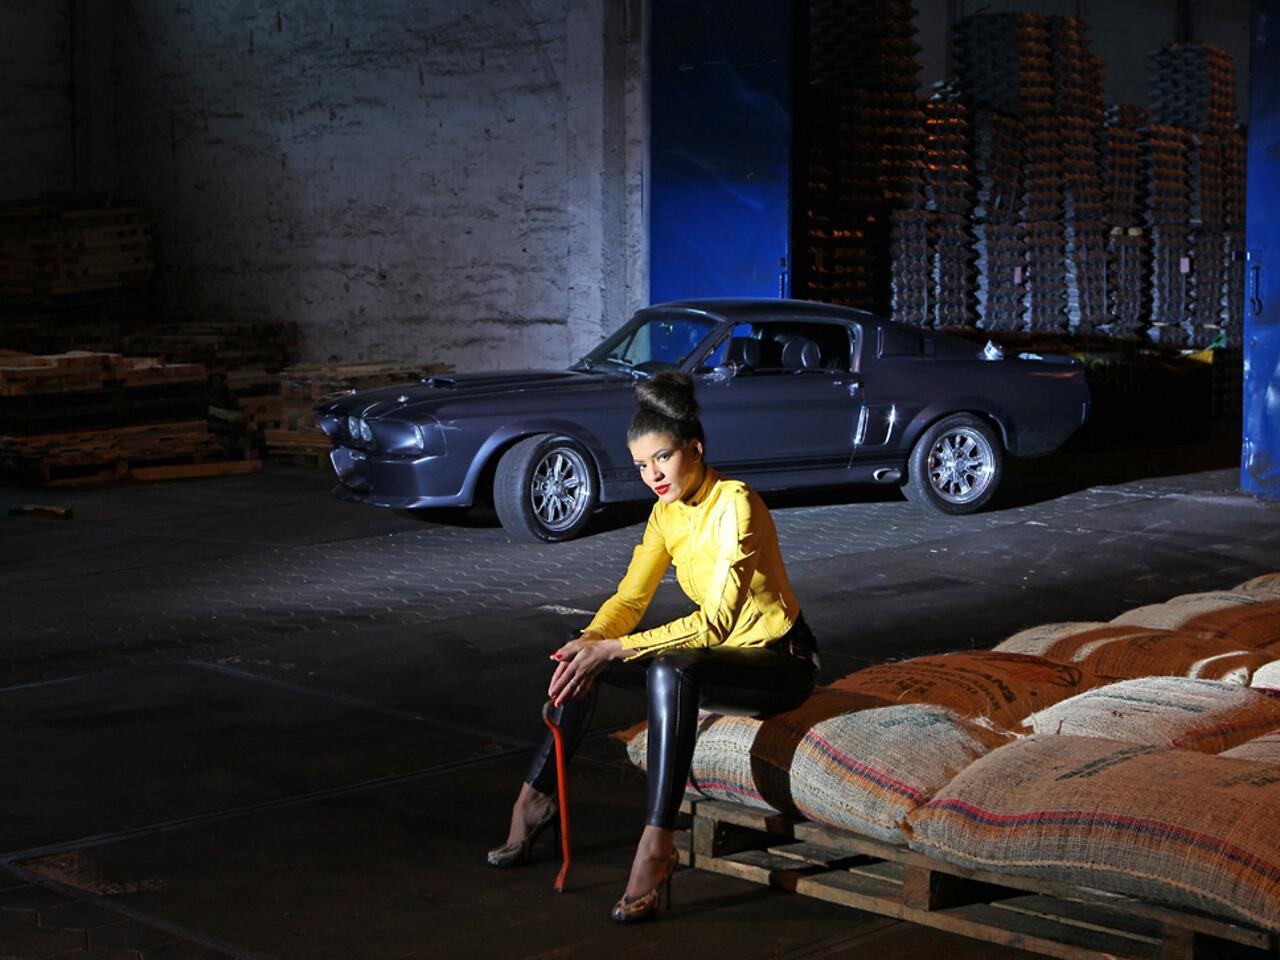 neuer bildband f r us car fans ami schlitten muscle cars und pin up girls web de. Black Bedroom Furniture Sets. Home Design Ideas